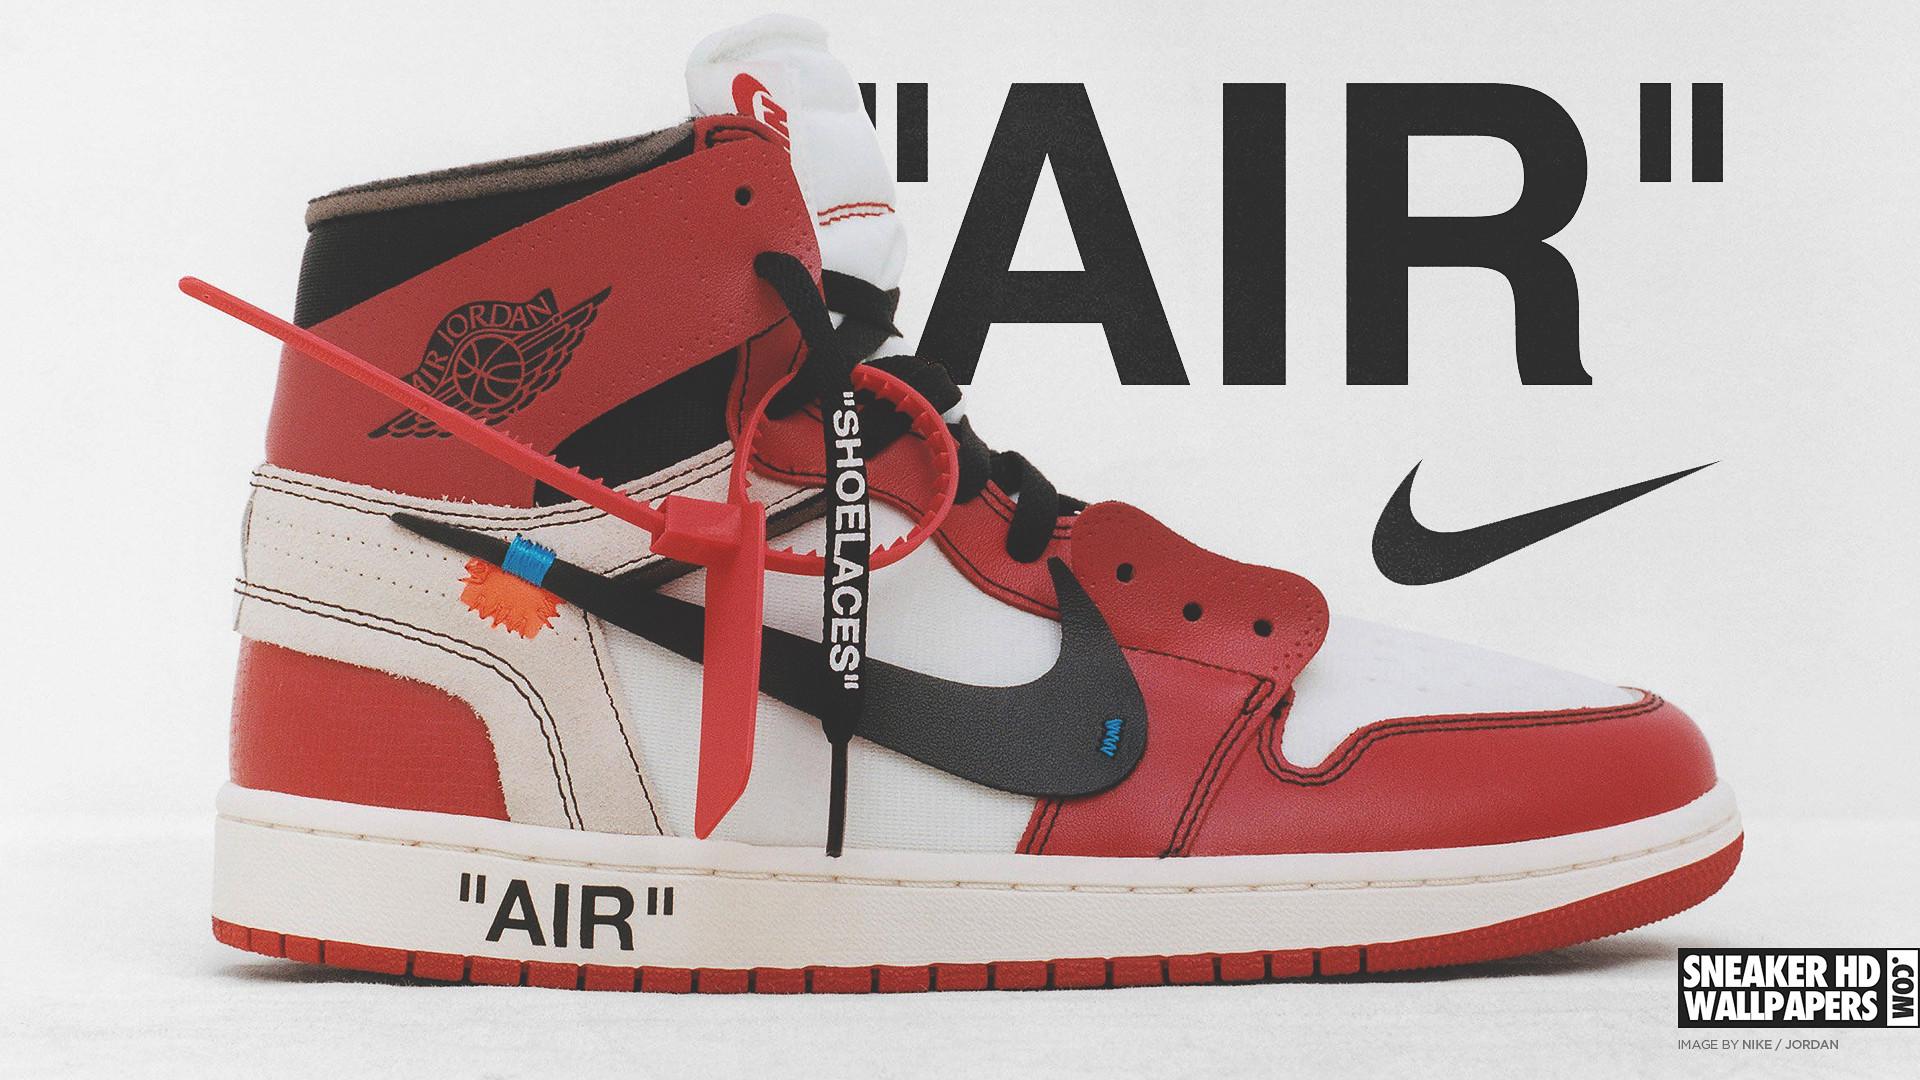 1080x1920 Jordan Fly Wade Nike Shoe Art #iPhone #6 #plus #wallpaper